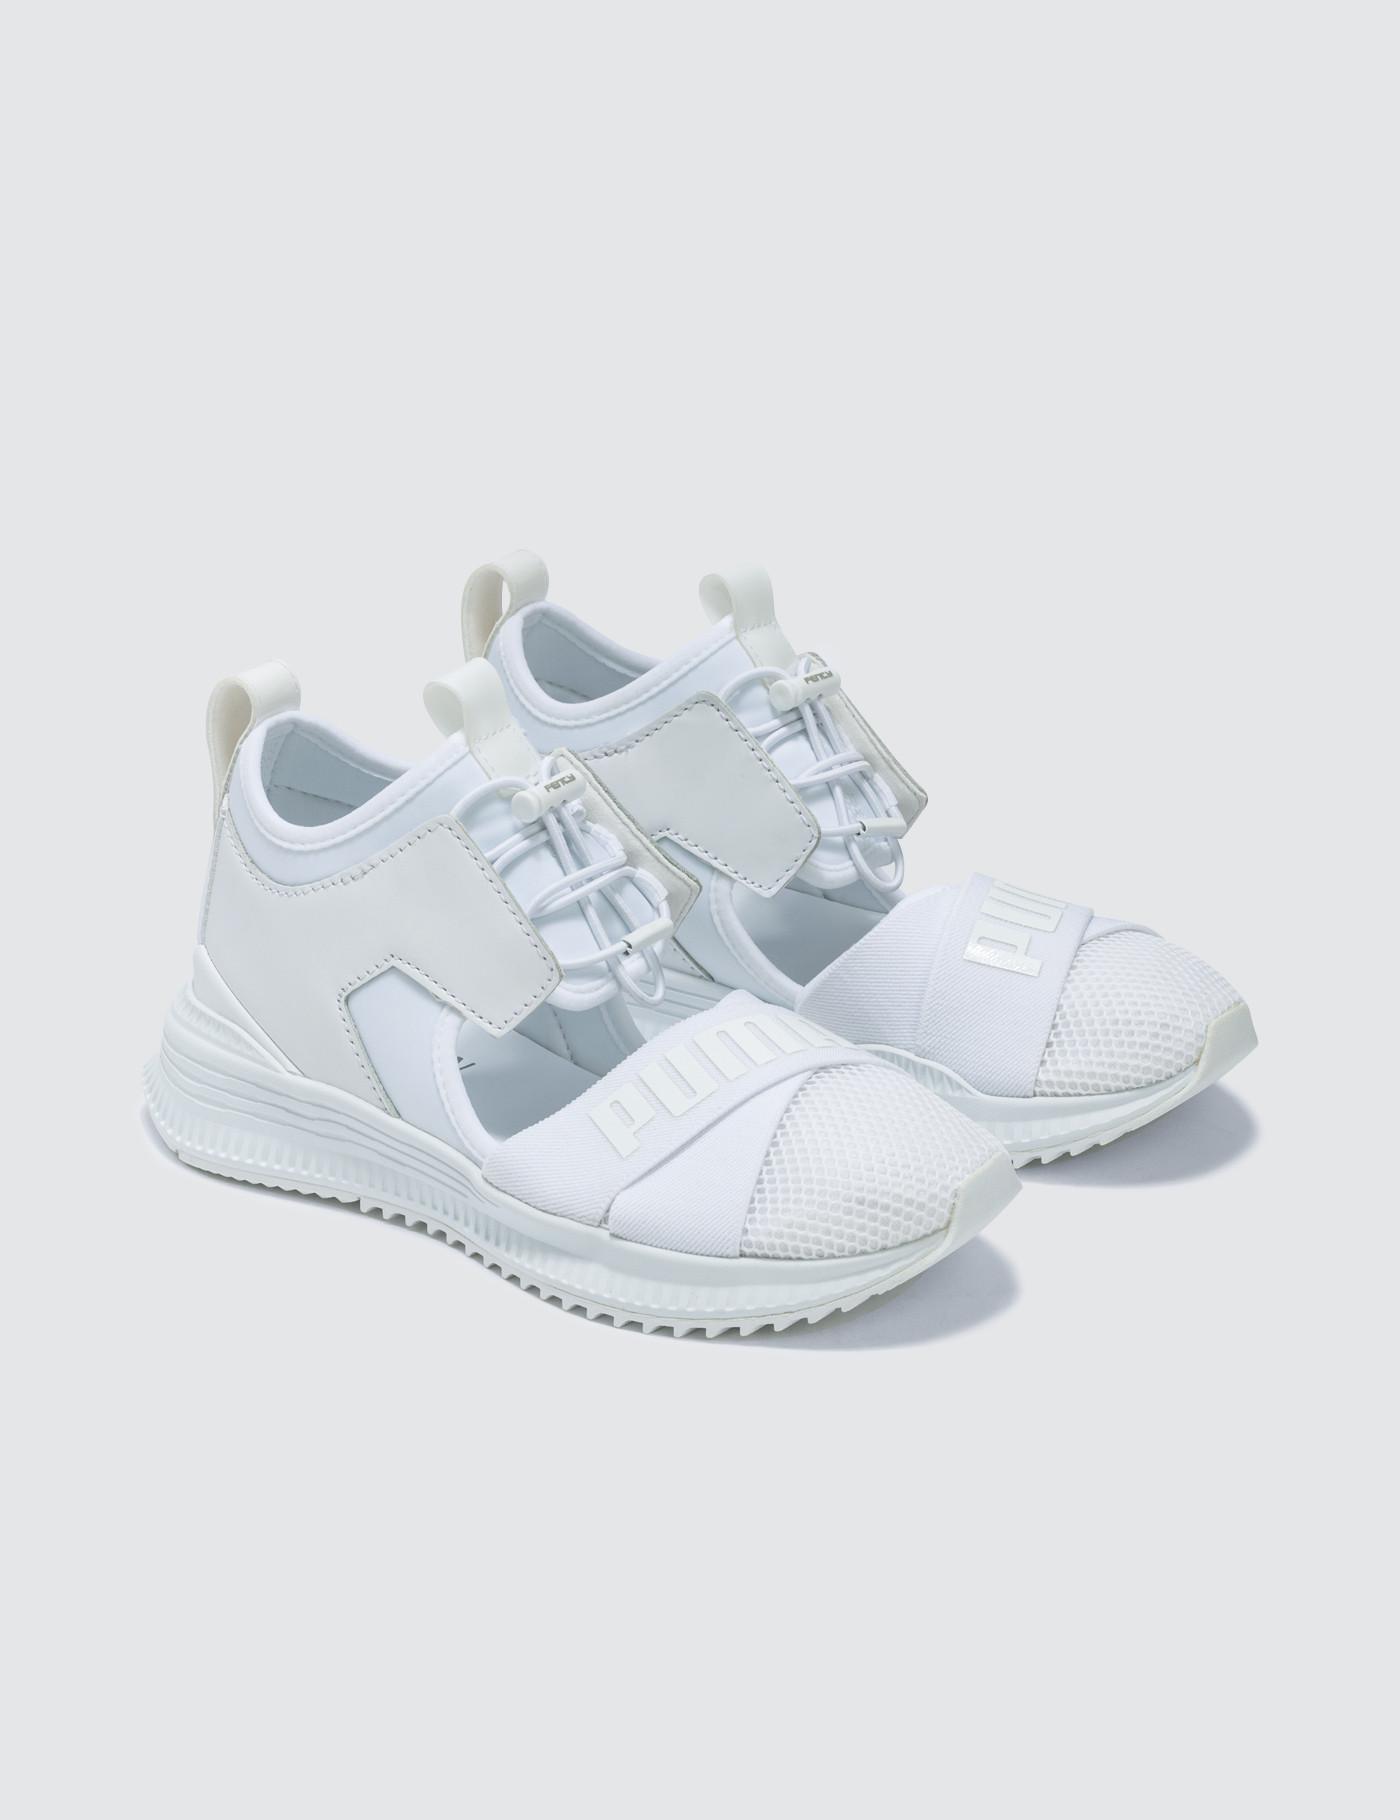 best sneakers 1e244 9b833 PUMA White Fenty Avid Wns Trainers